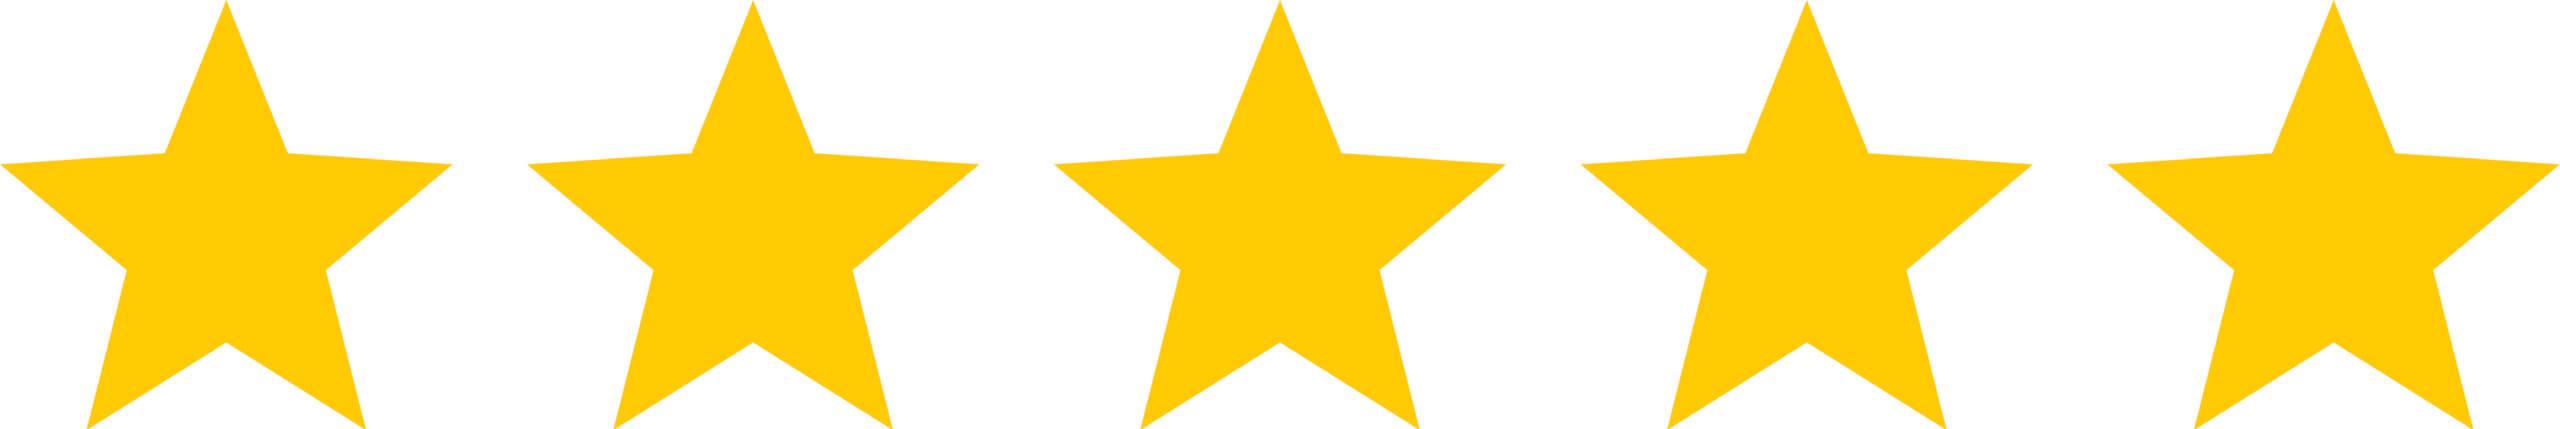 5 Sterne